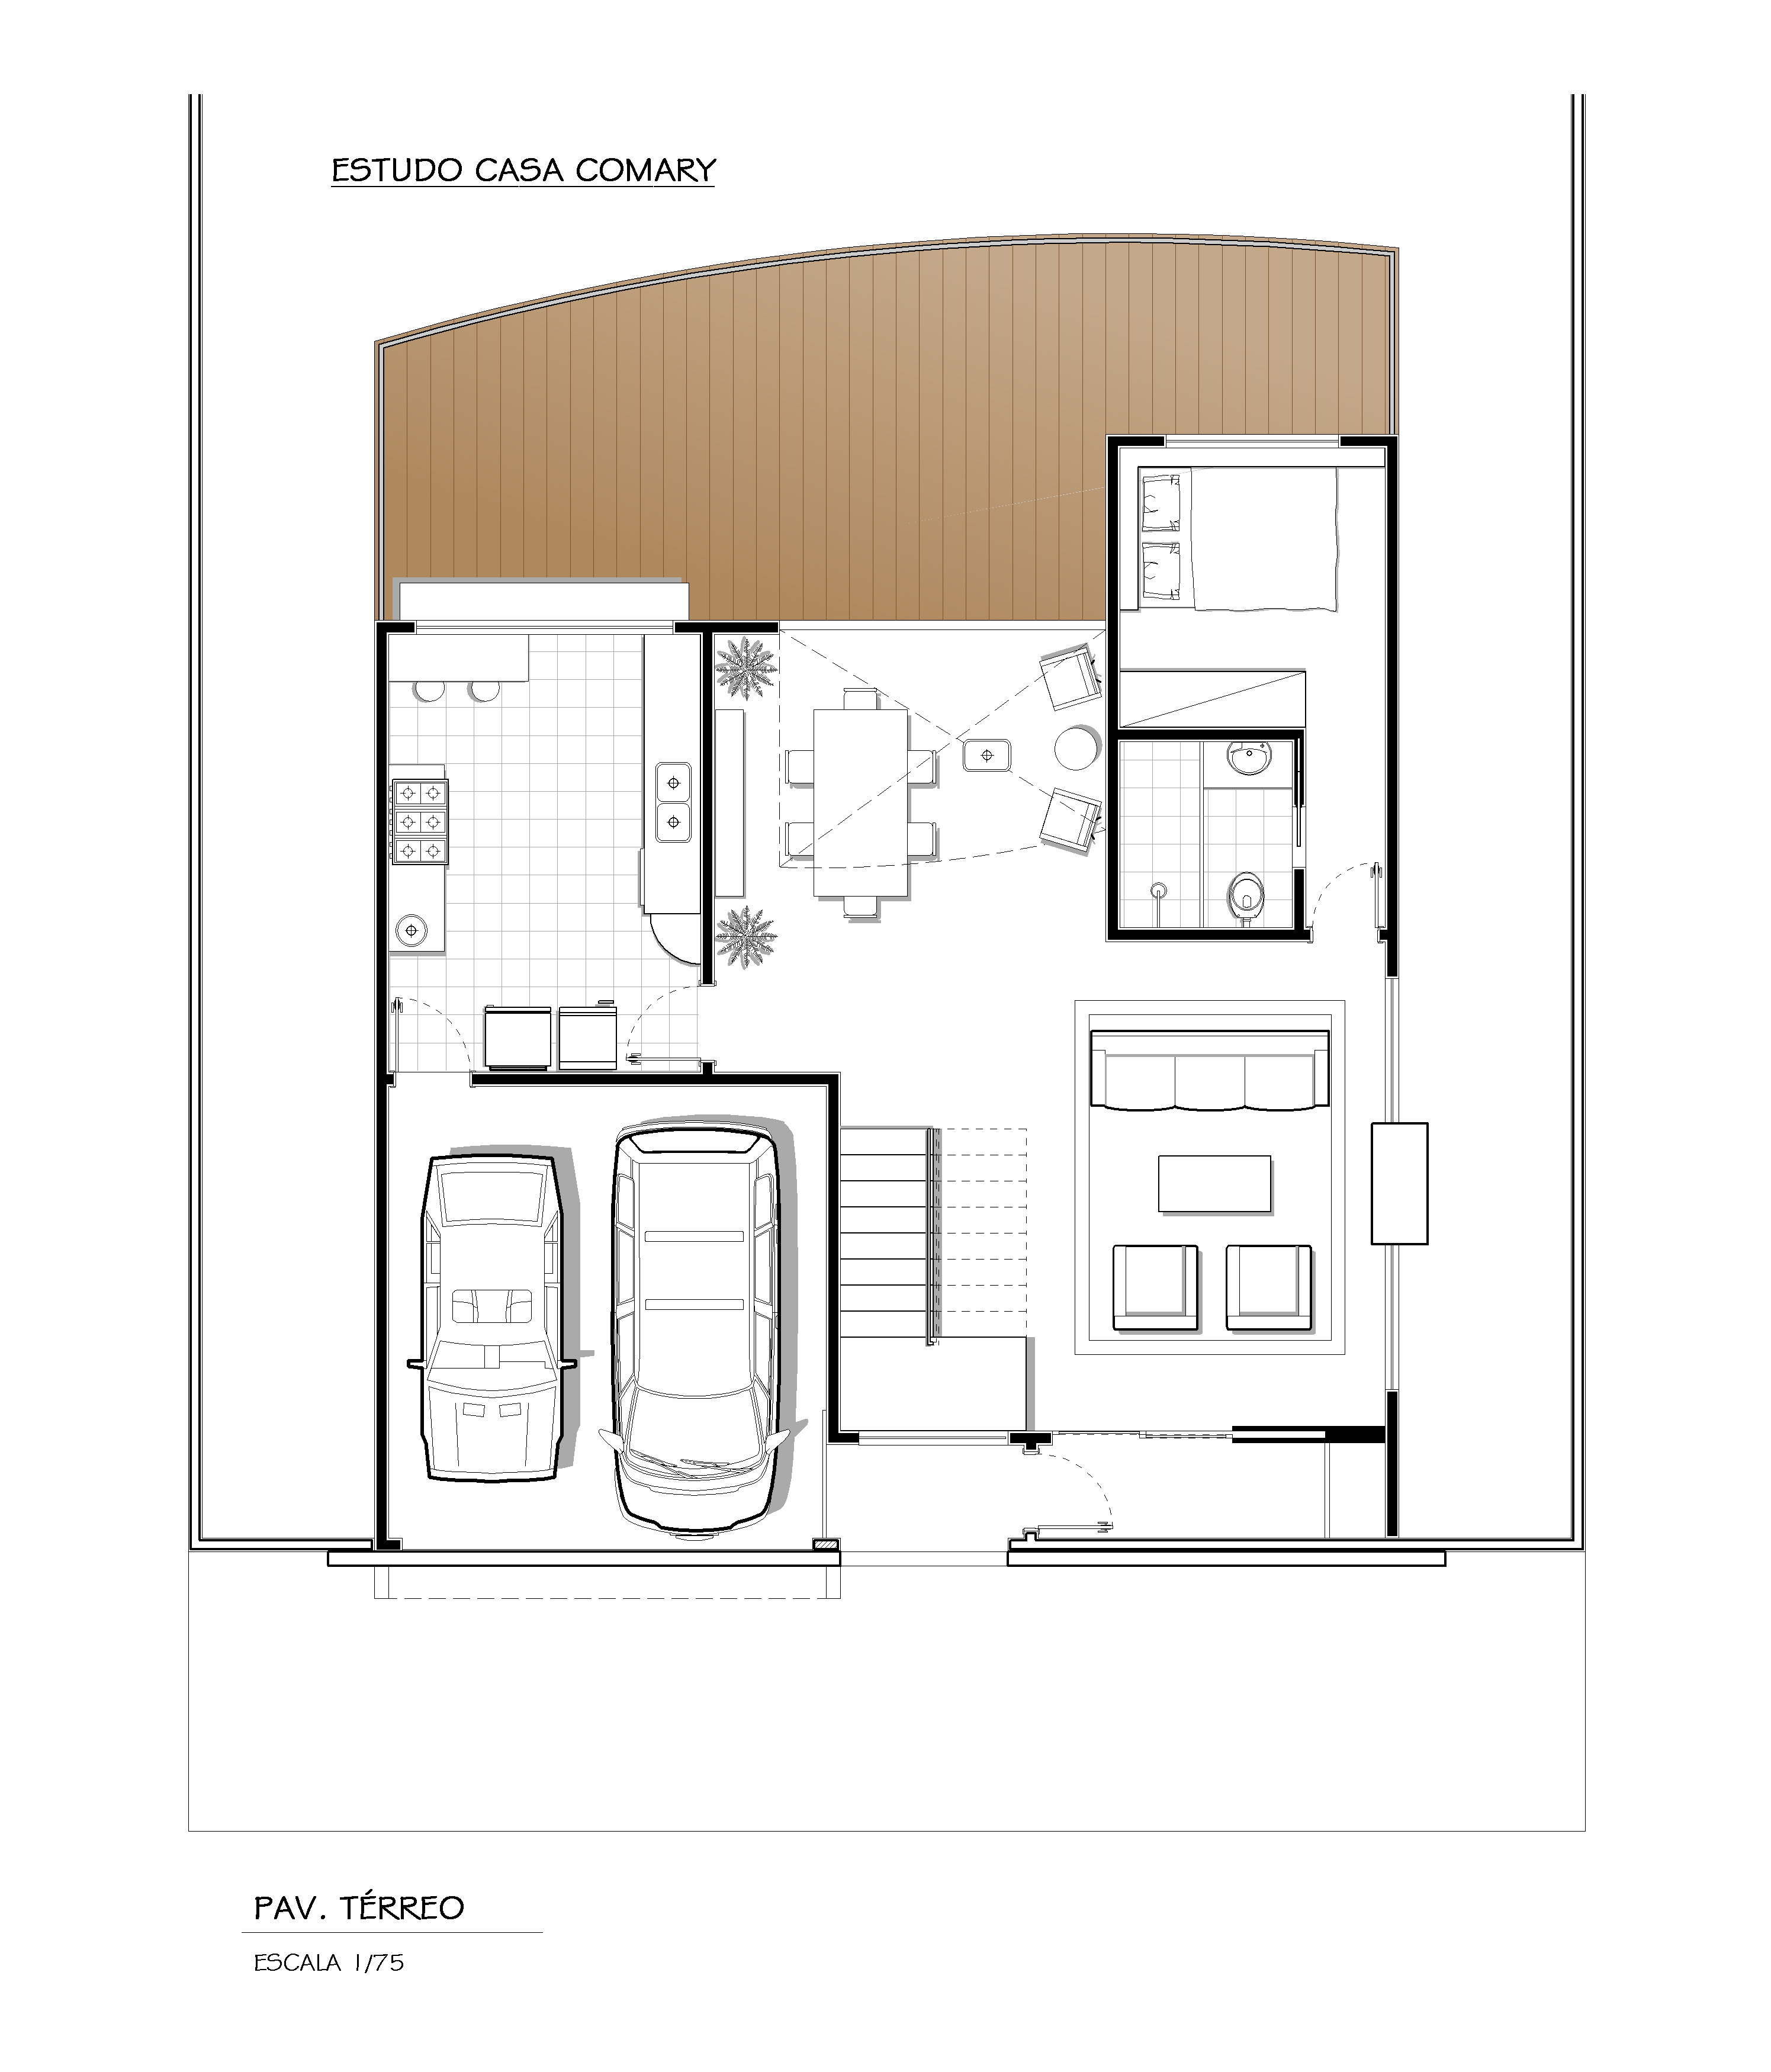 casa2 planta 1pav